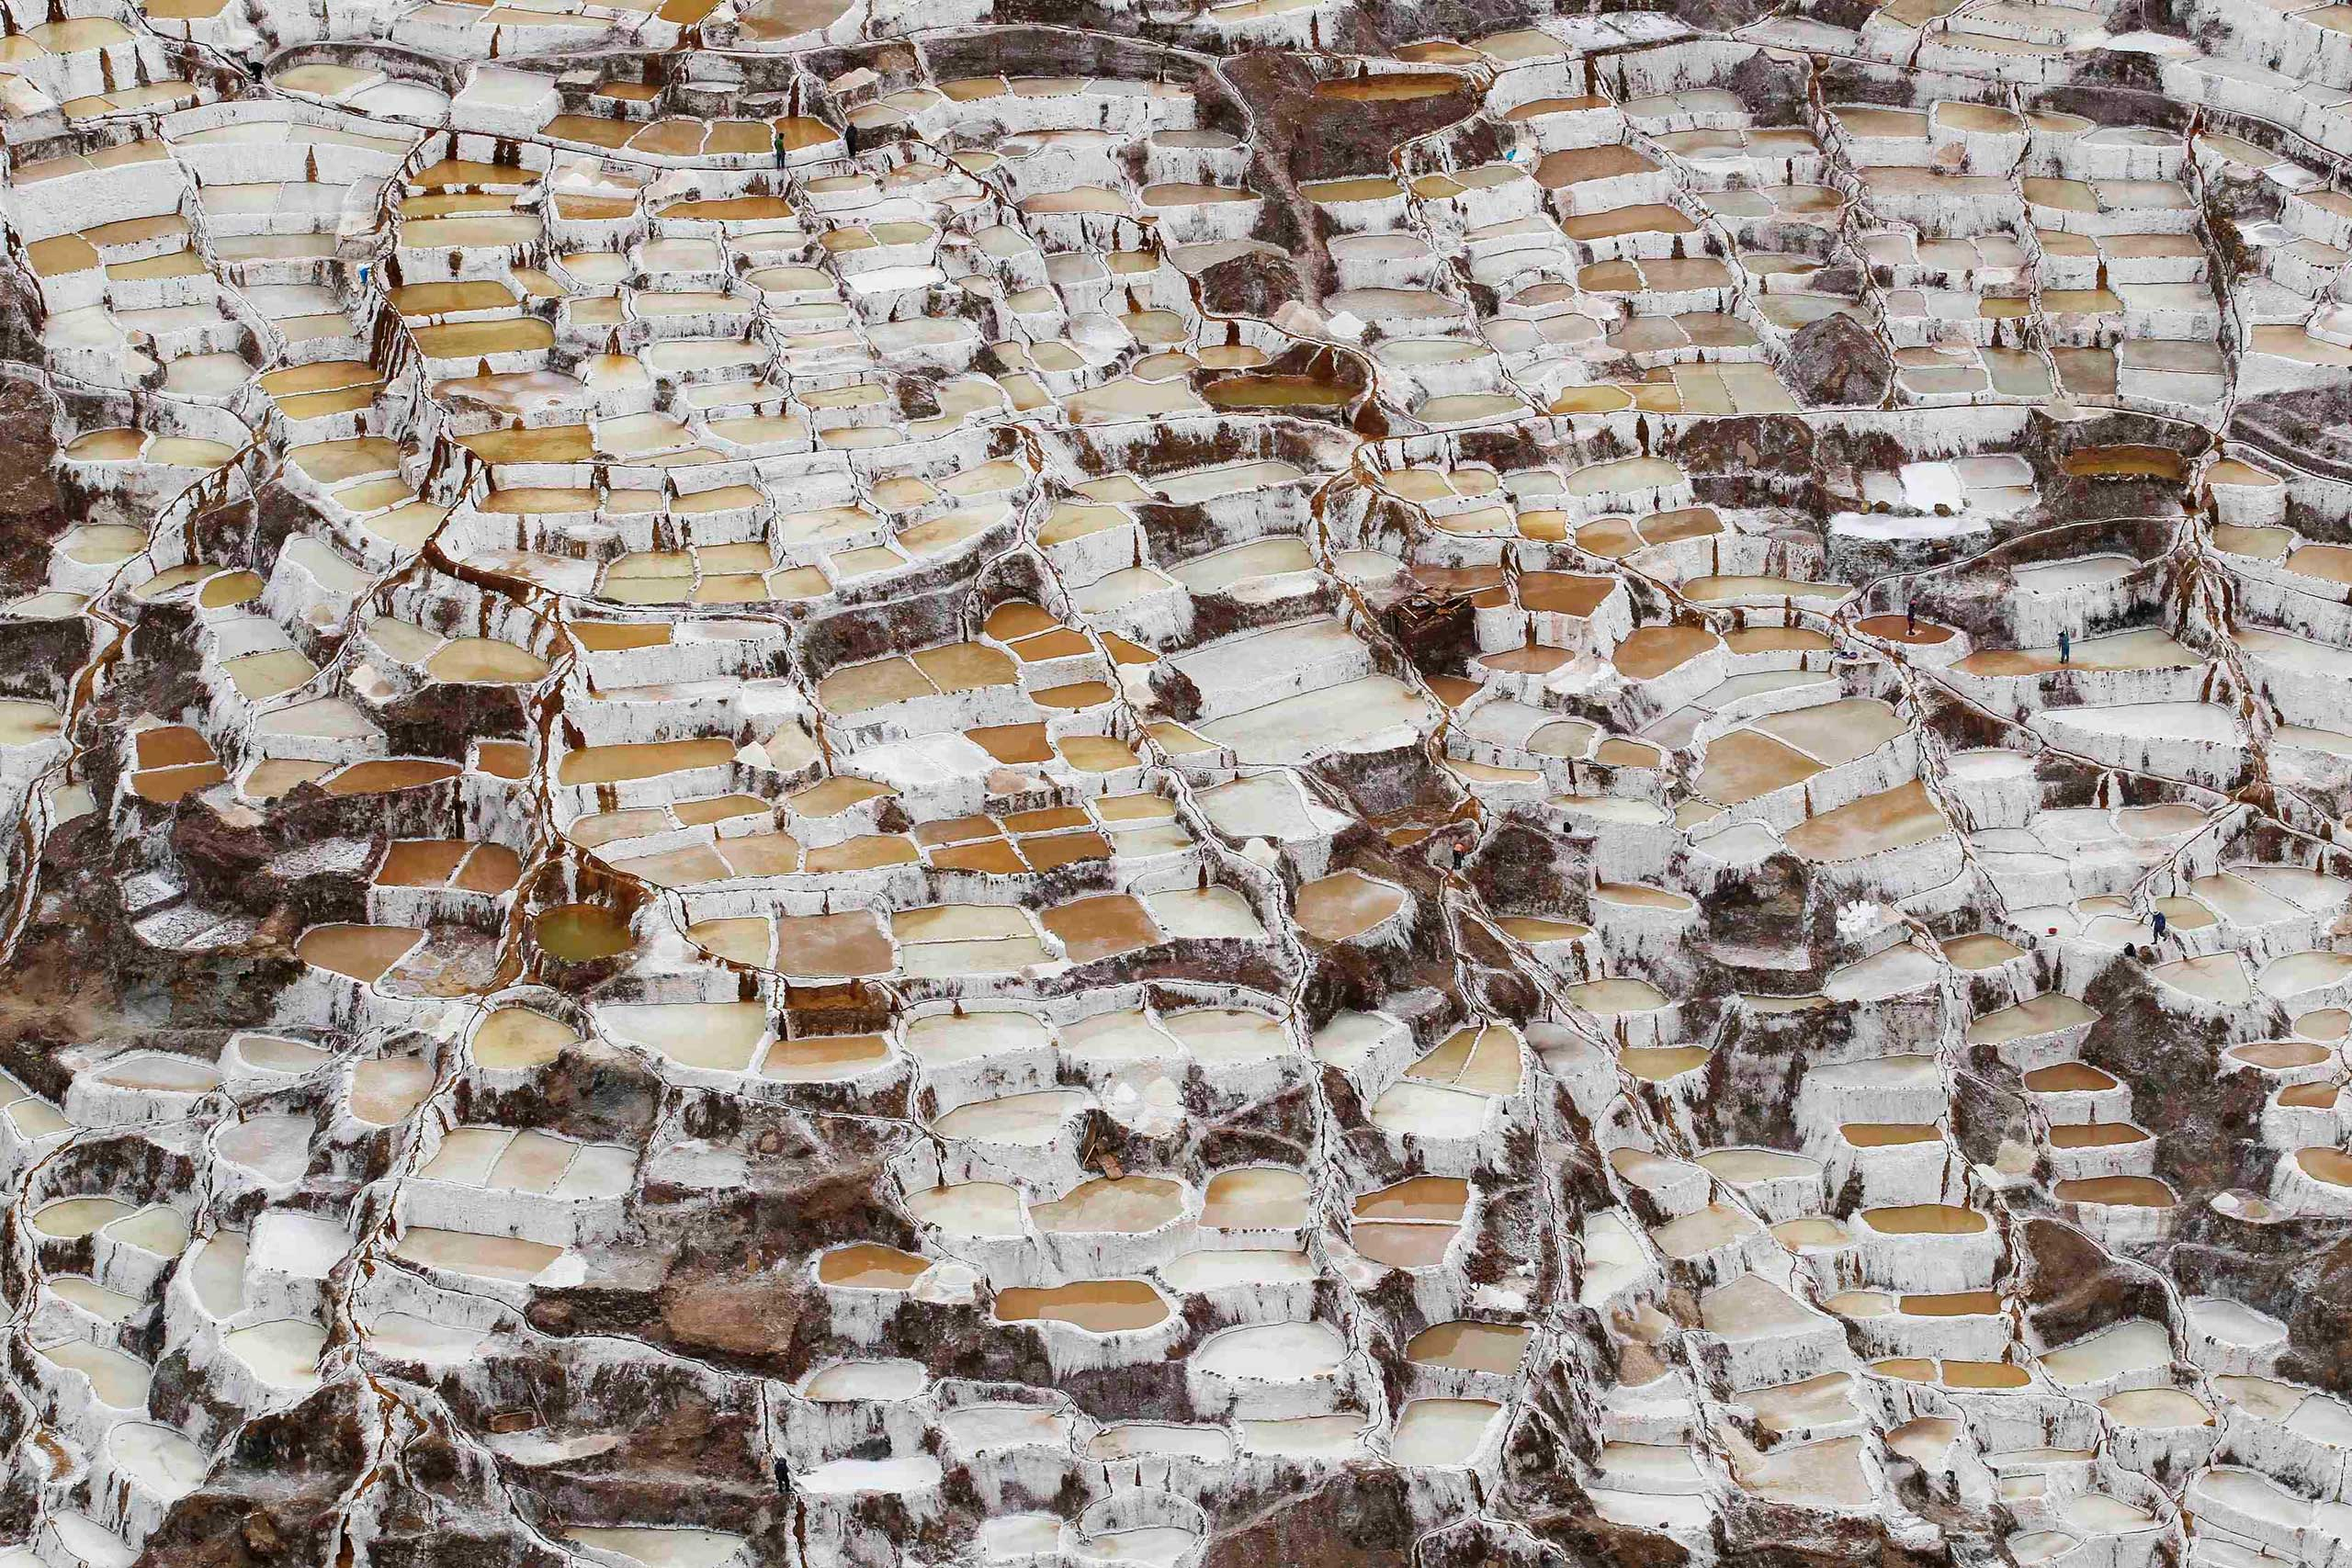 Dec. 3, 2014. A view of salt ponds at the Maras mines in Cuzco, Peru.